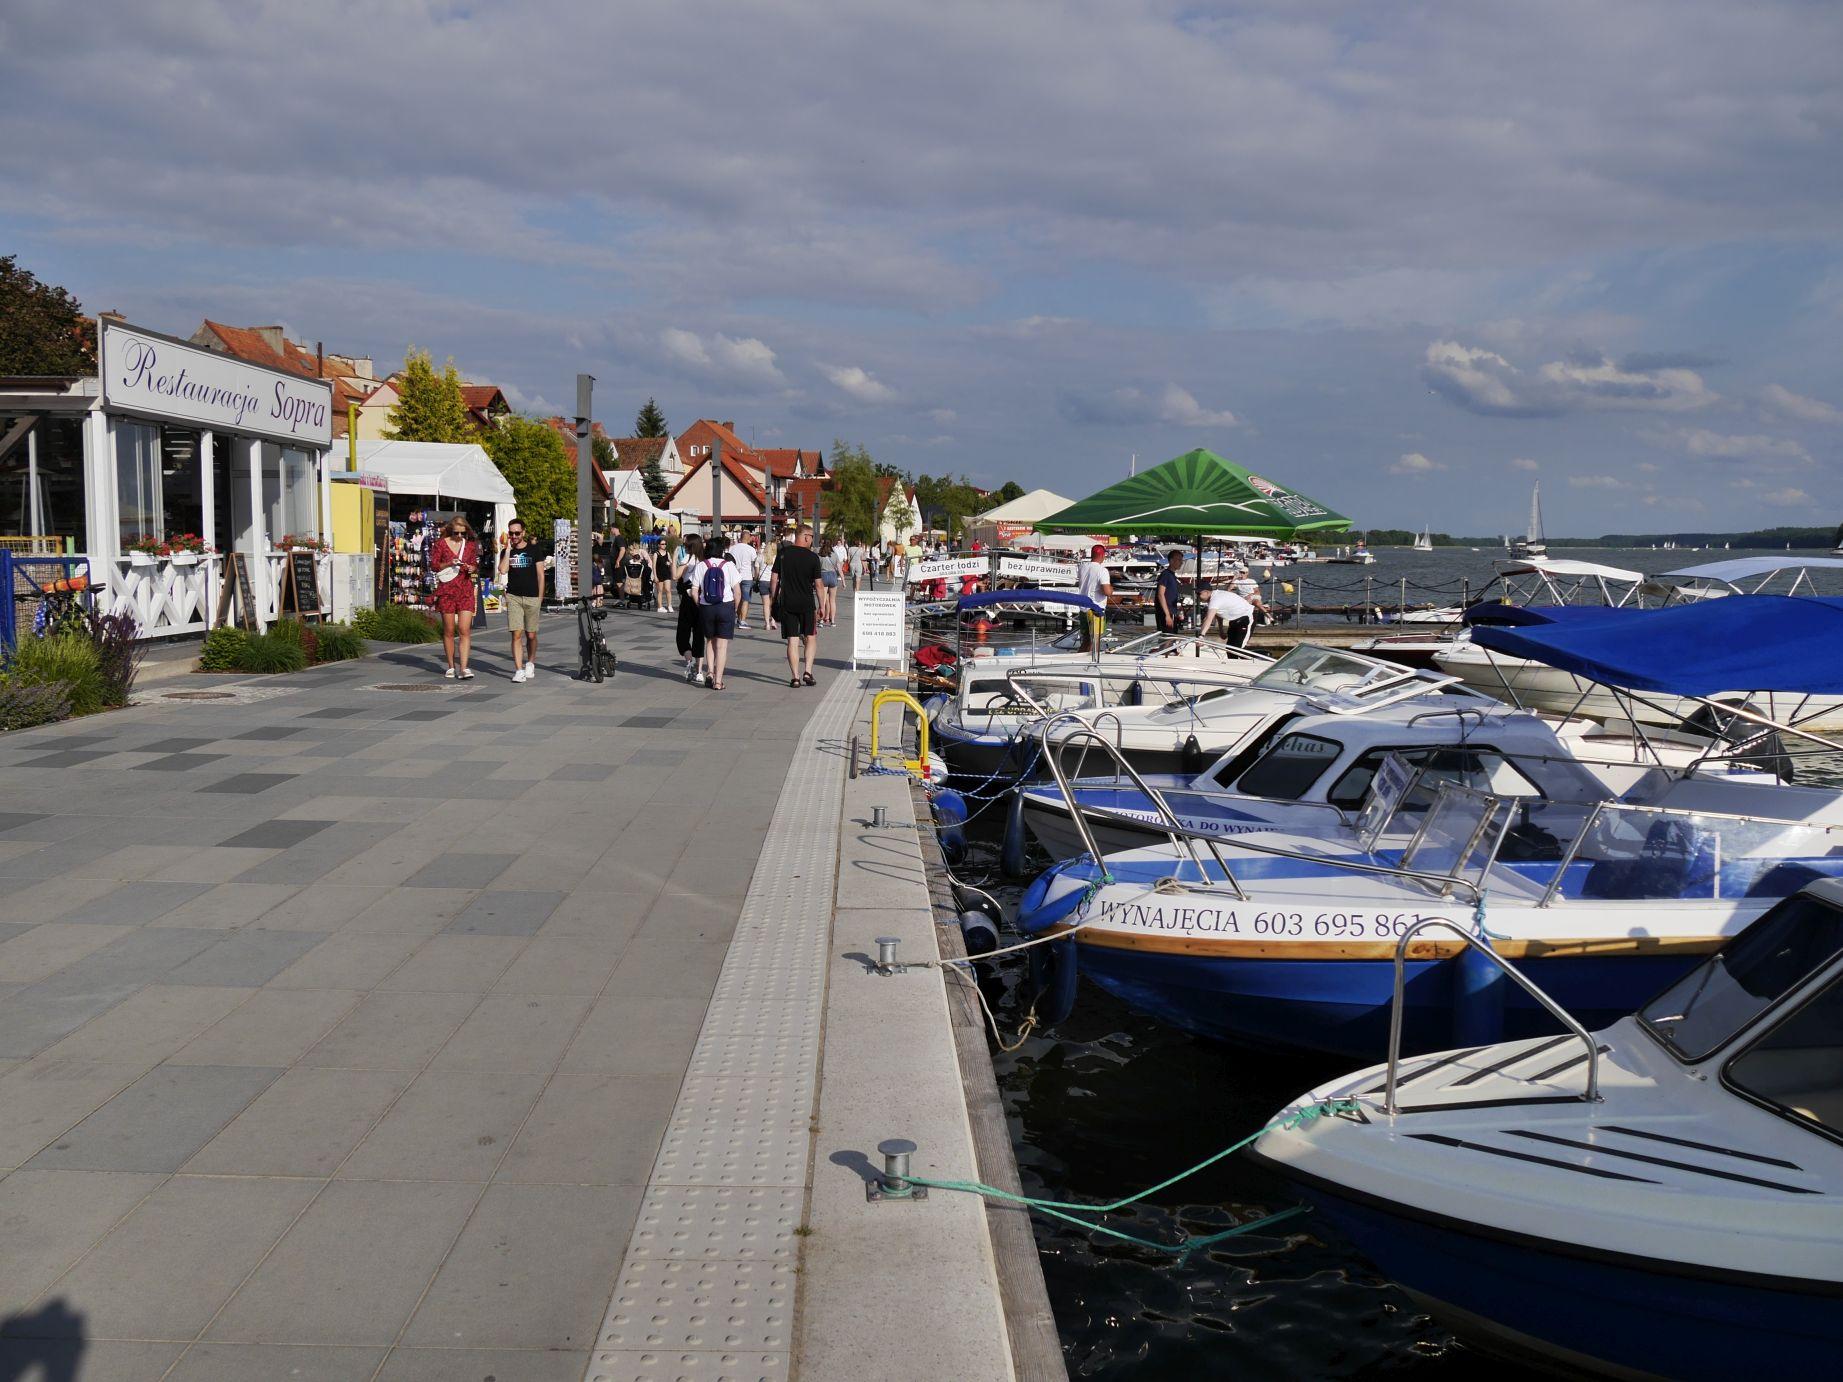 Uferpromenade in Nikolaiken (Mikołajki)